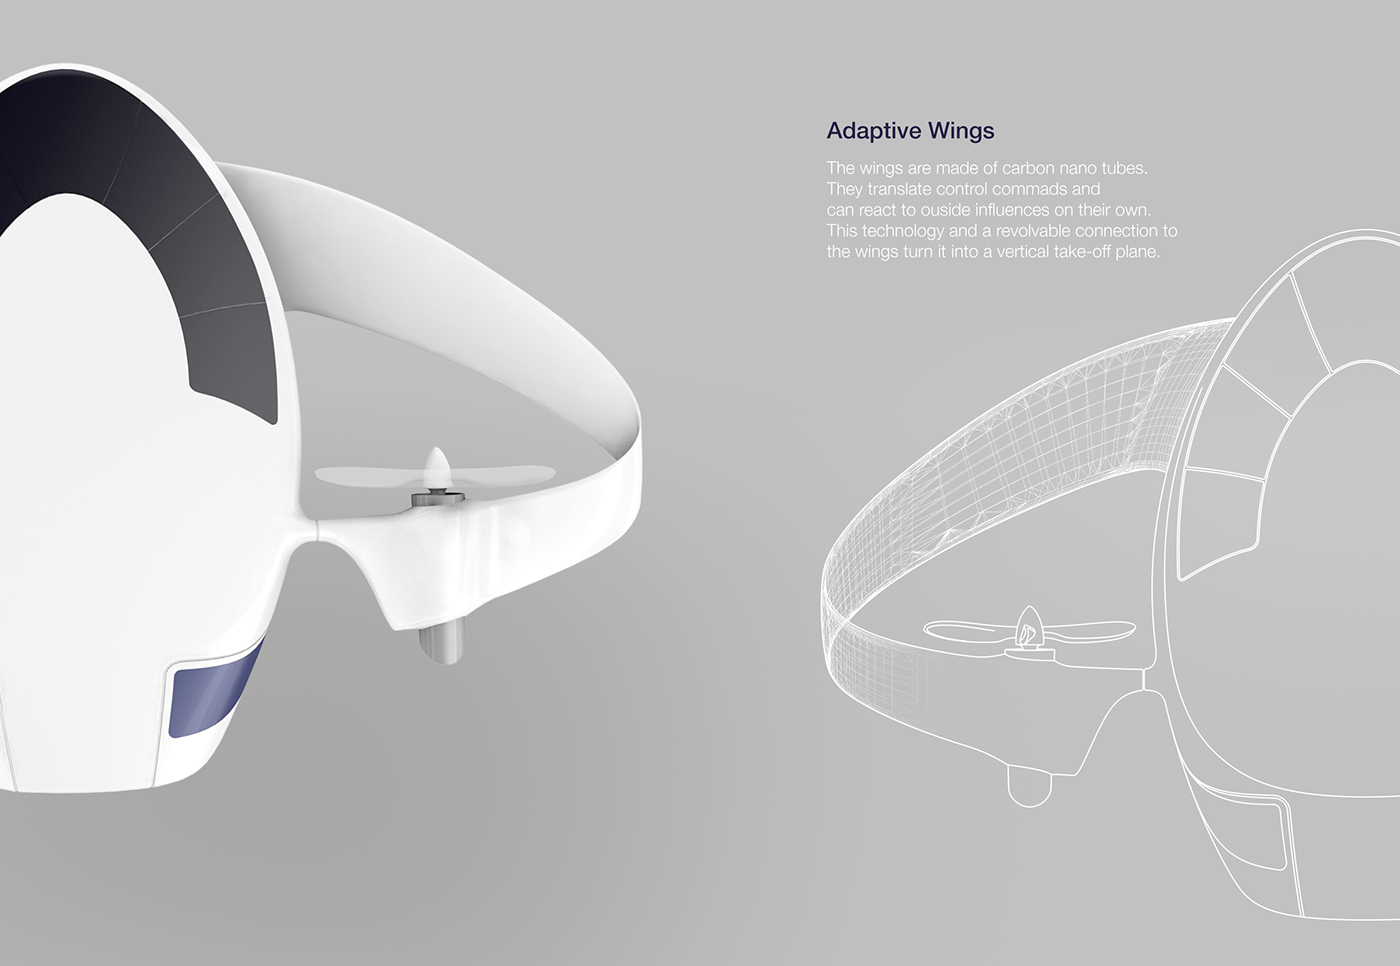 airplane short haul pininfarina shuttle airport carbon nanotubes wings plane Aircraft vertical take-off